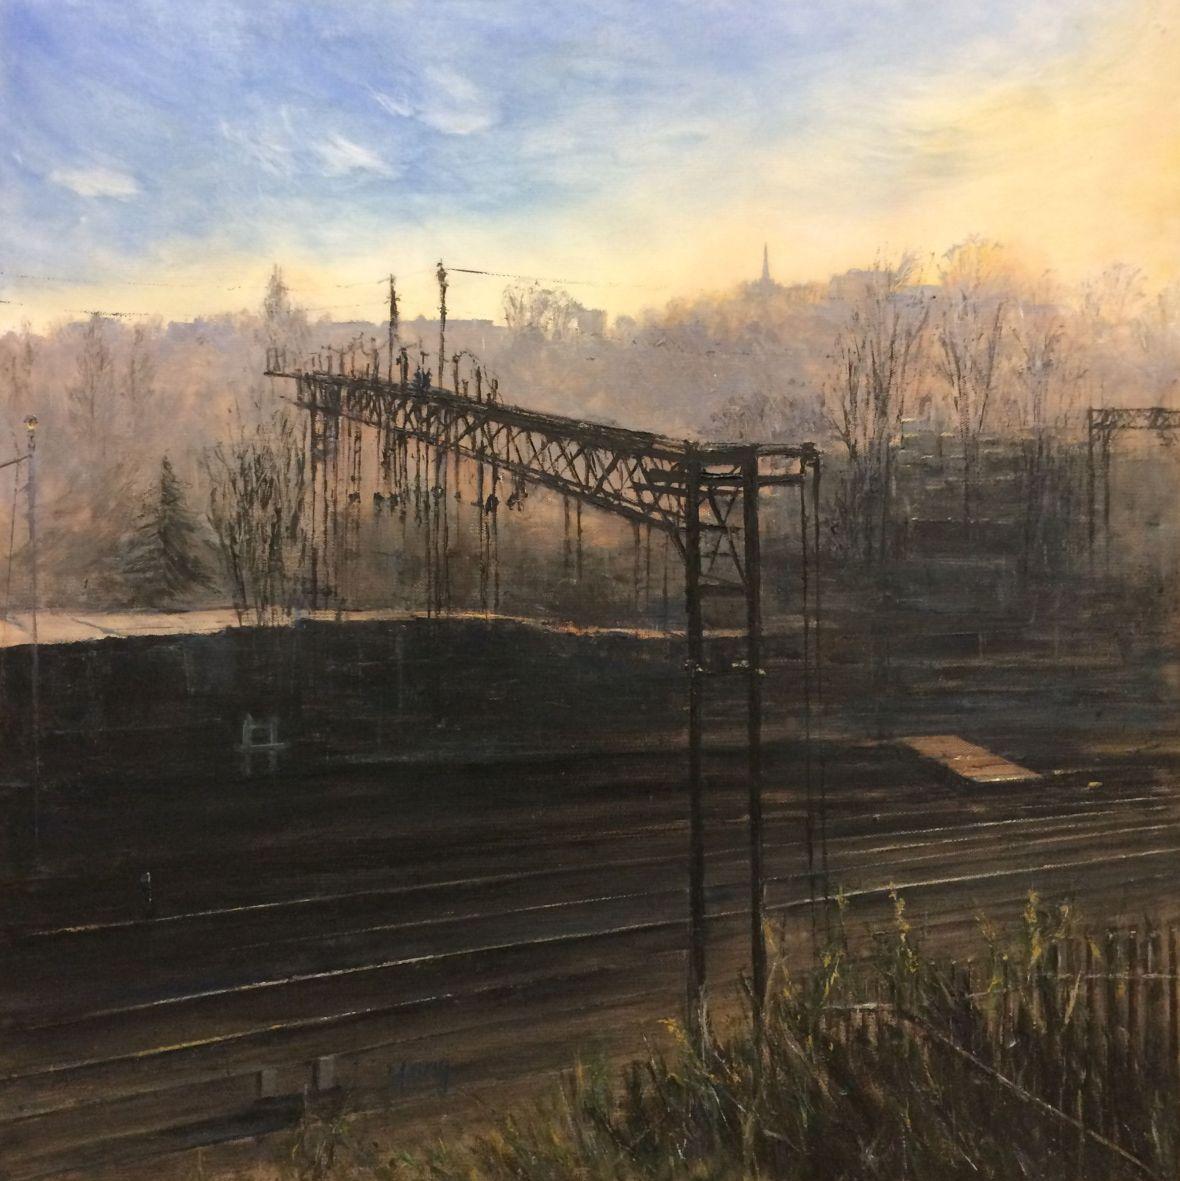 Kings Heath Train Depot, Morning. 2017. Yang Yuxin